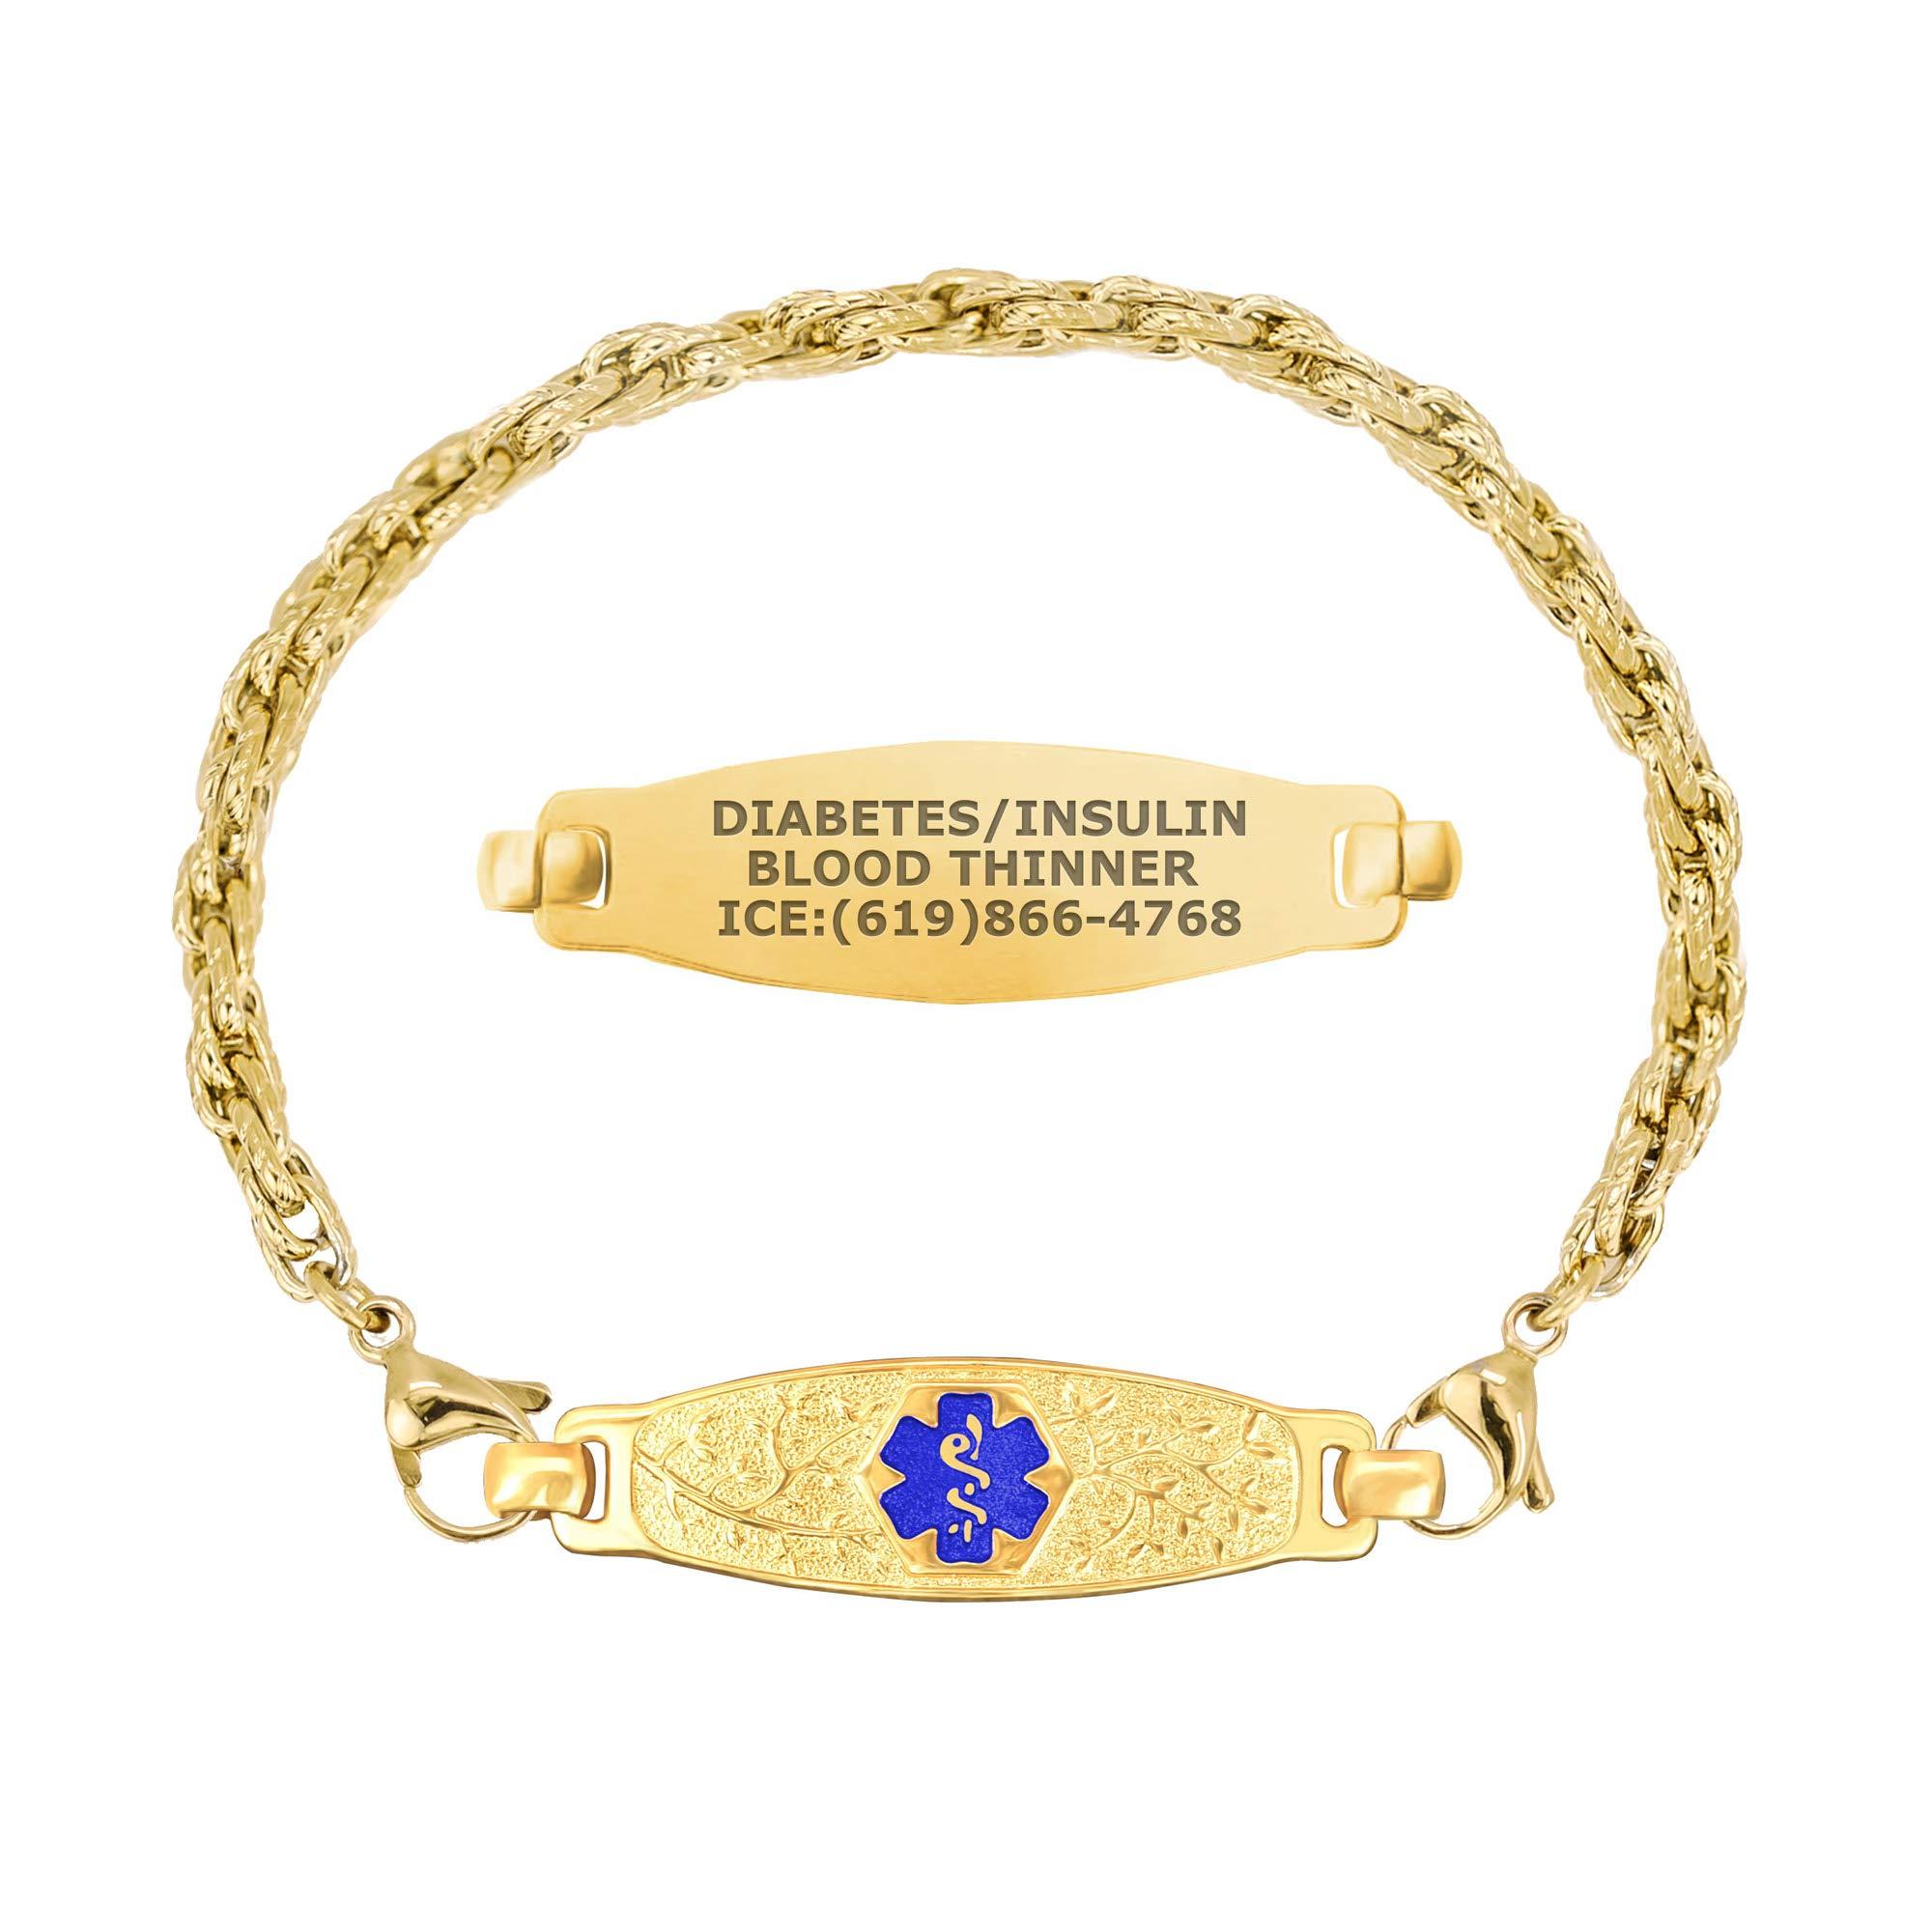 Divoti Custom Engraved Medical Alert Bracelets for Women, Stainless Steel Medical Bracelet, Medical ID Bracelet w/Free Engraving - PVD Gold Elegant Olive Tag w/PVD Gold Rope-TP Blue-8.0'' by Divoti